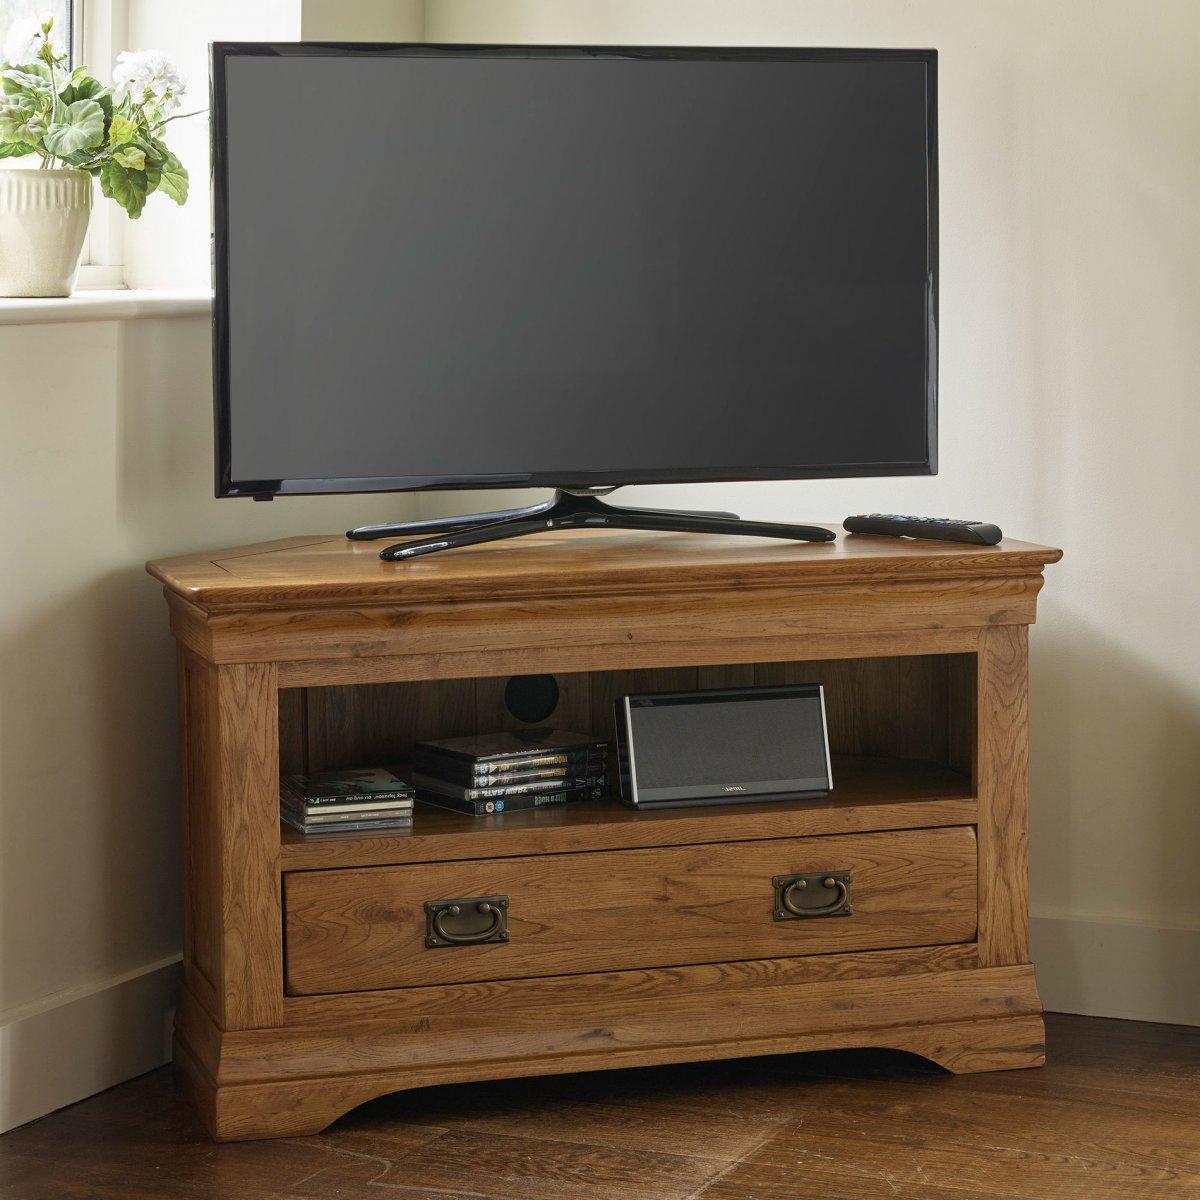 French Farmhouse Corner Tv Unit | Solid Oak | Oak In Avalene Rustic Farmhouse Corner Tv Stands (View 5 of 20)